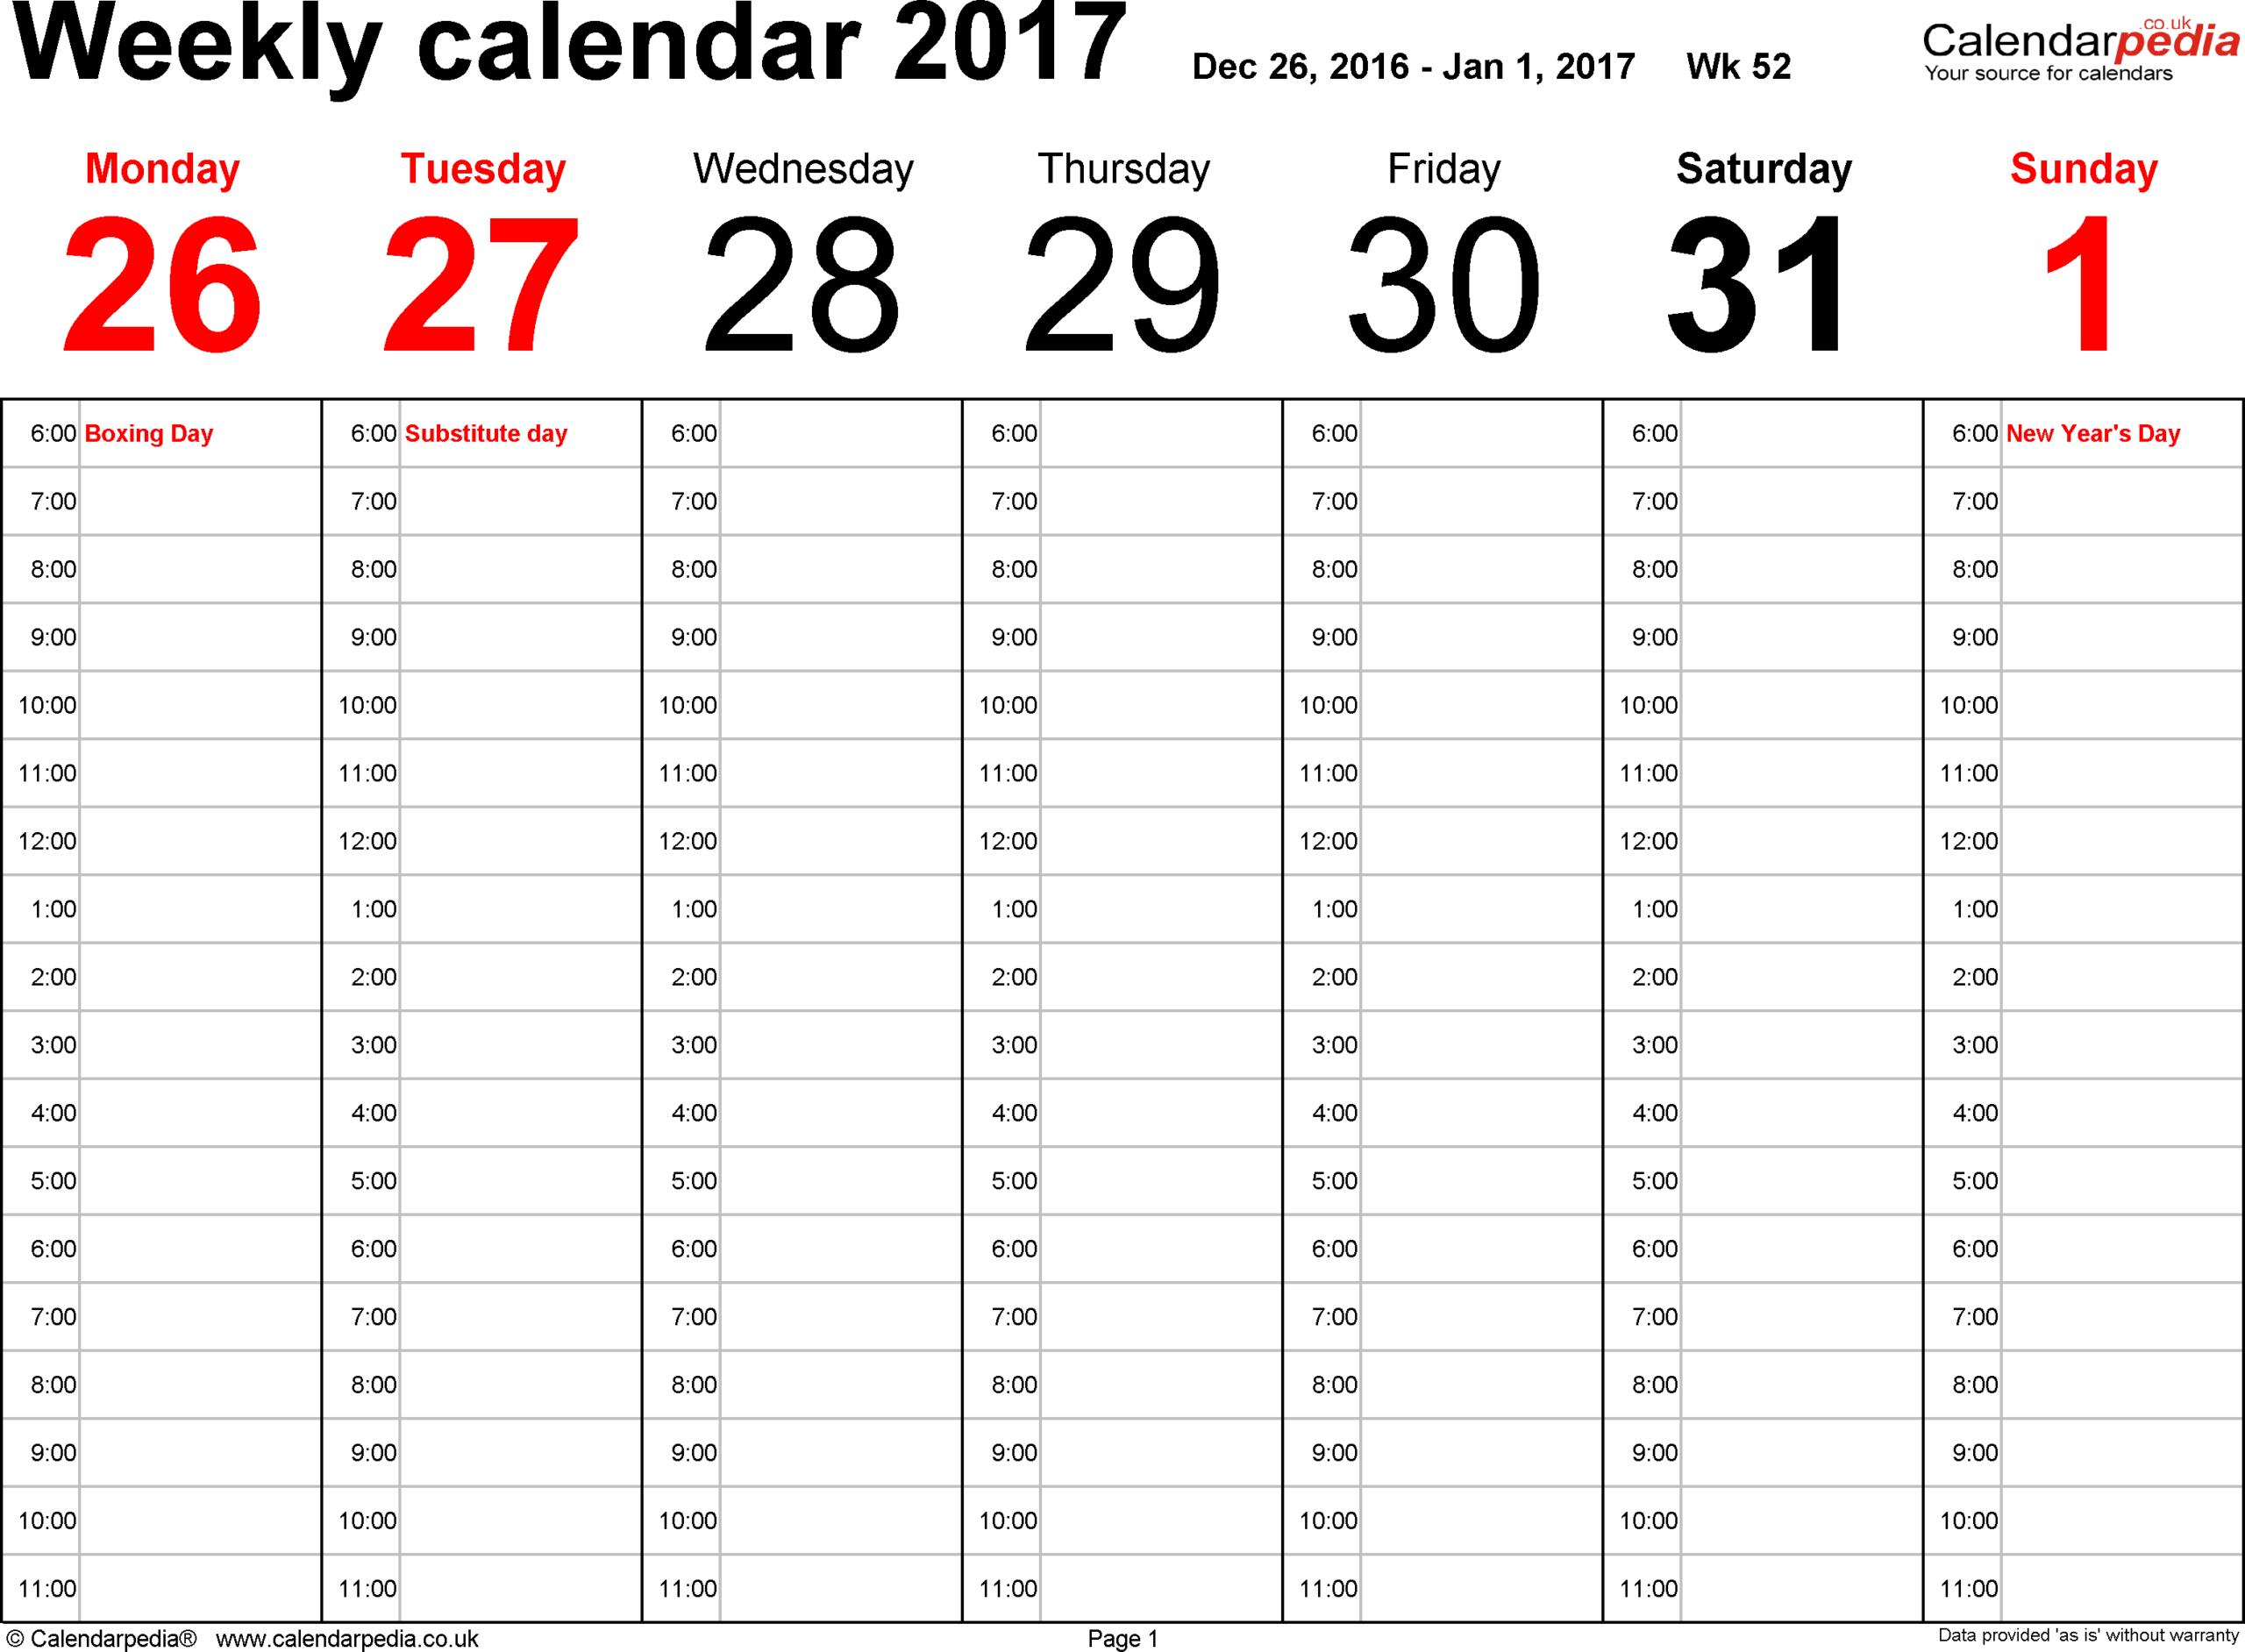 Weekly Calendar 2017 Uk - Free Printable Templates For Pdf